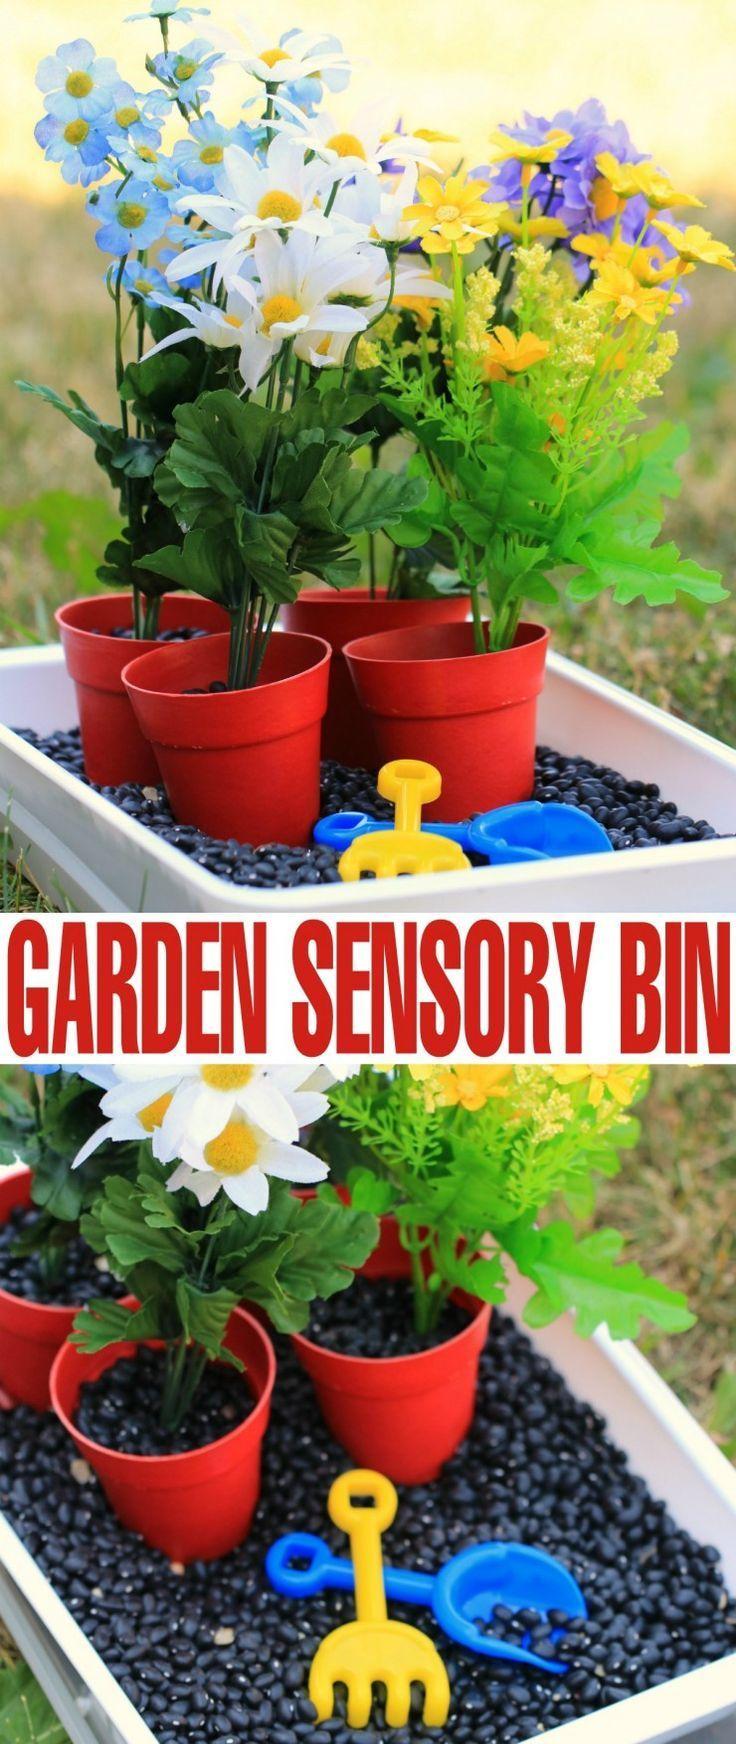 Garden-Sensory-Bin 2